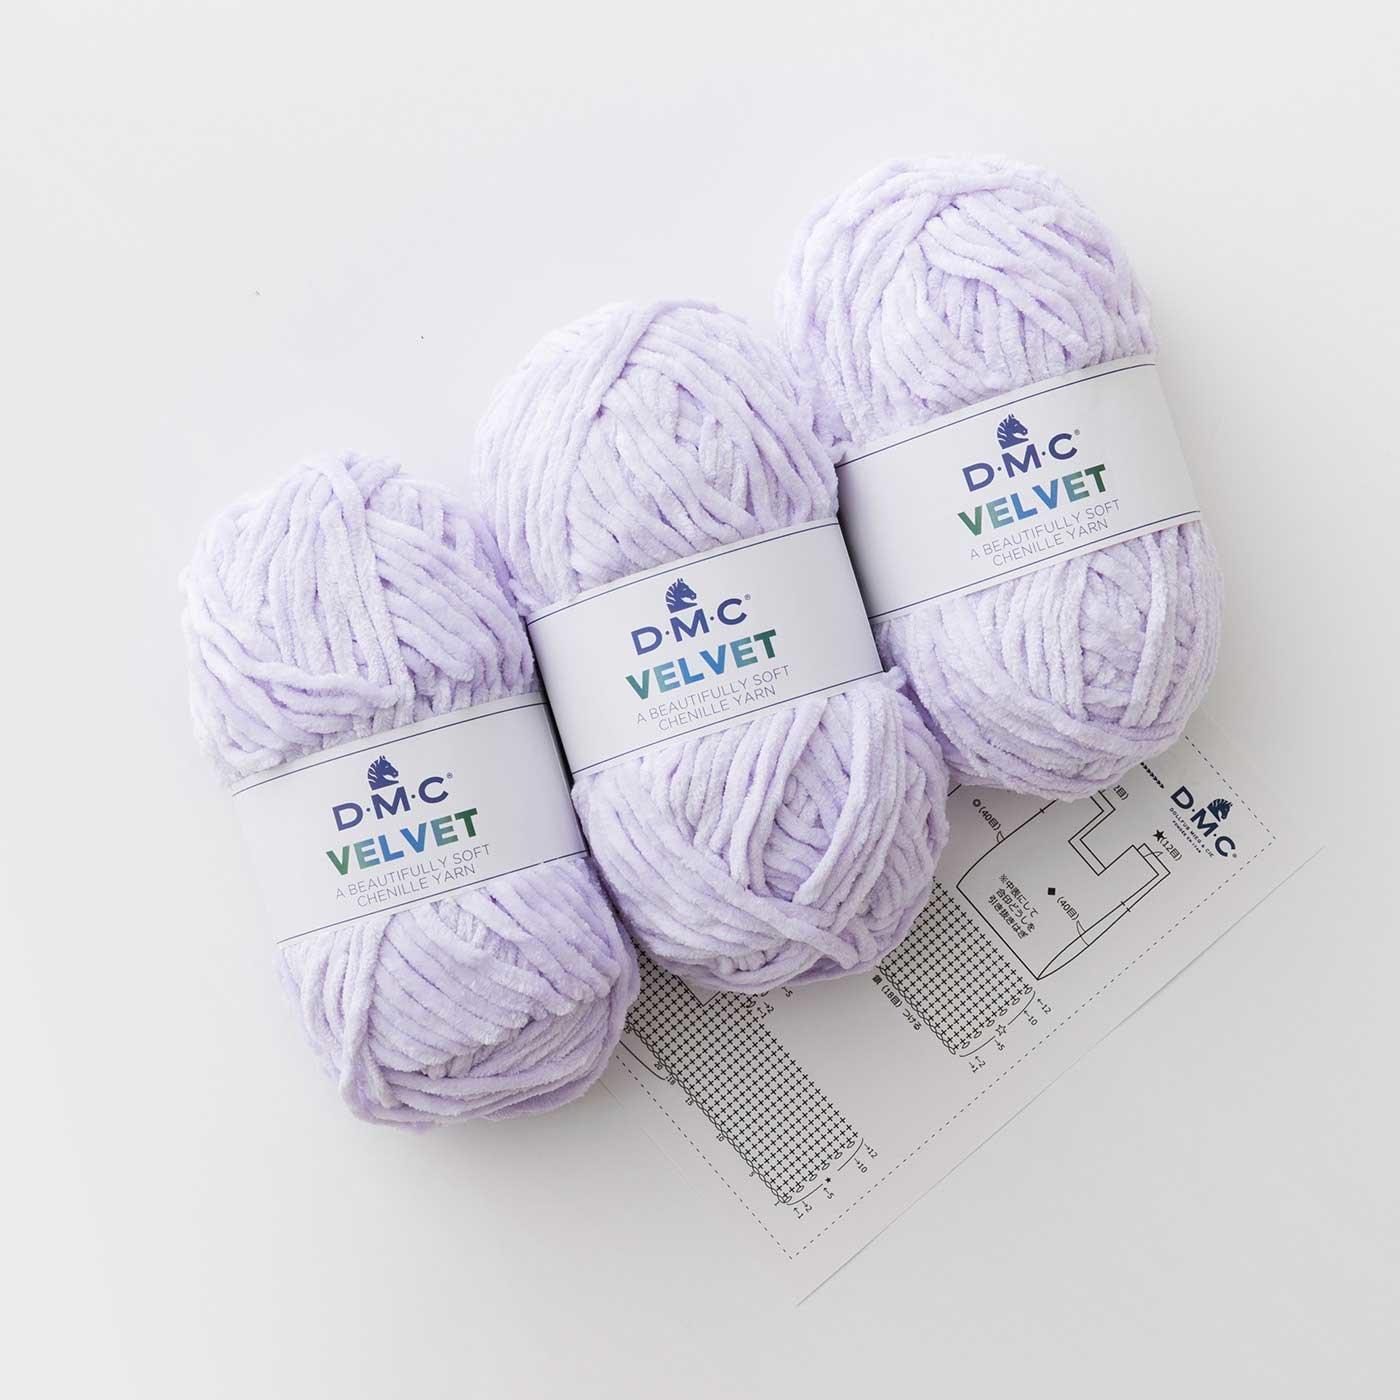 VELVET(ベルベット)で編むかぎ針編みバッグ